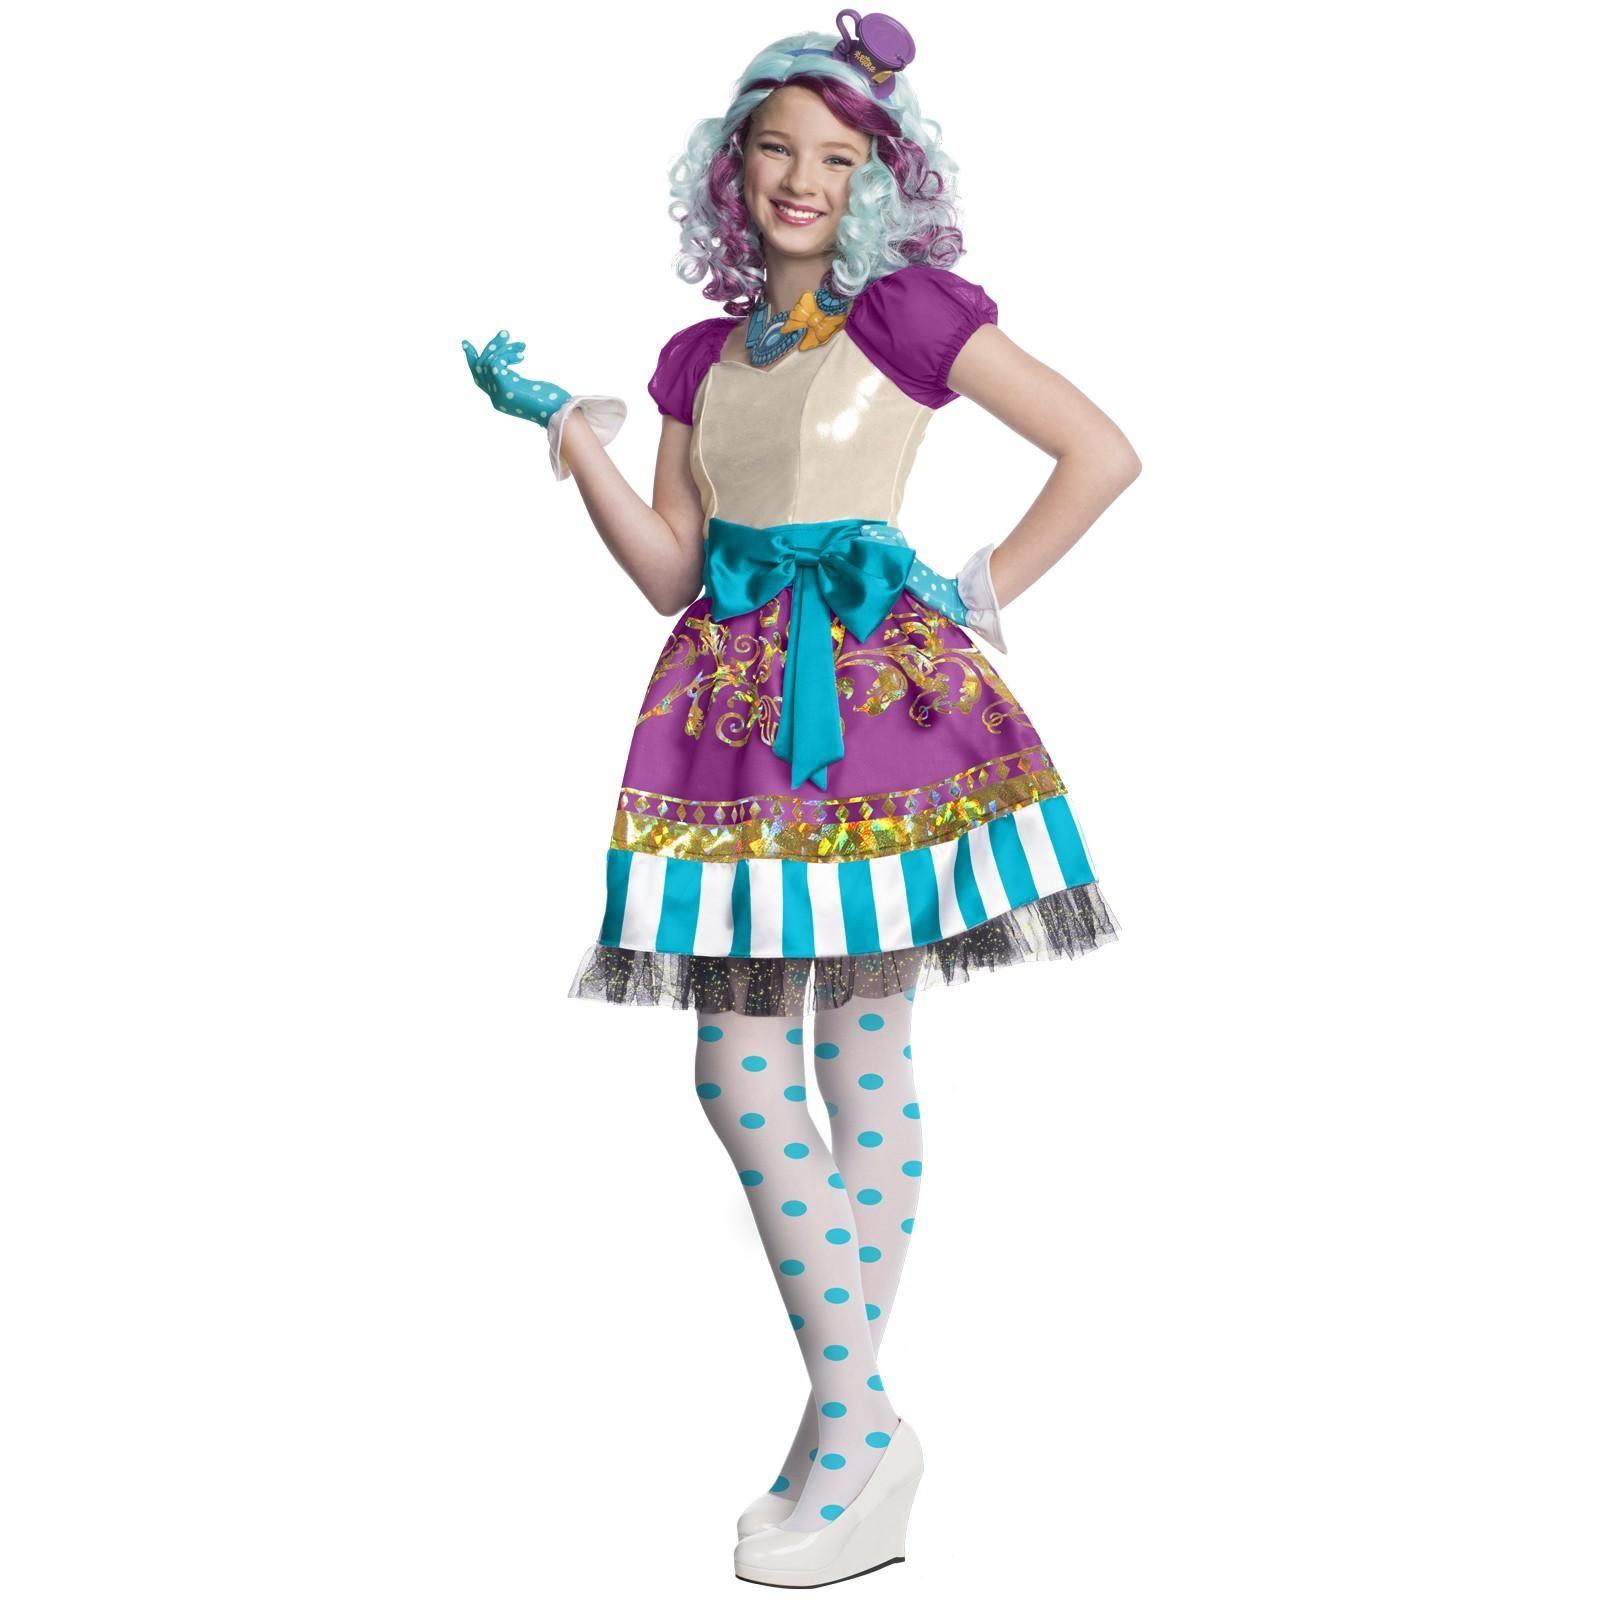 ever after high madeline hatter child costume - Mad Hatter Halloween Costume For Kids